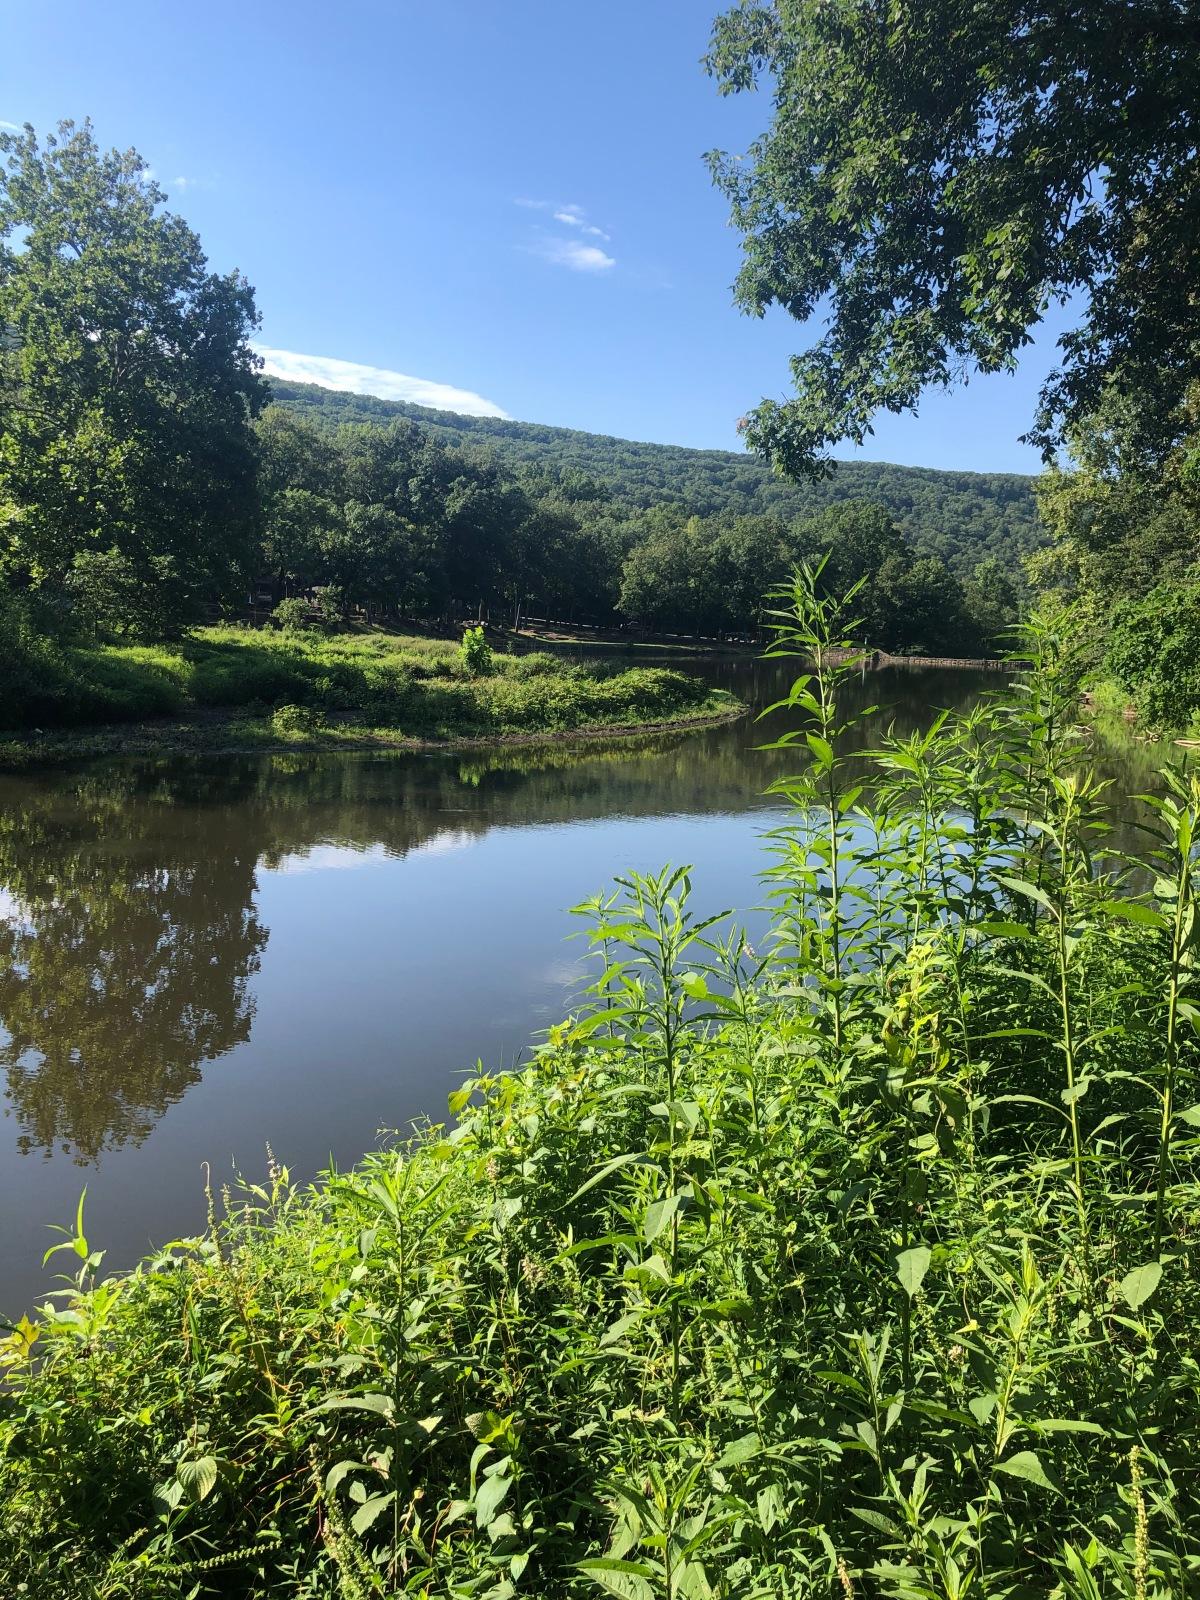 Hiking Arkansas: Lake Trail at Devil's Den StatePark